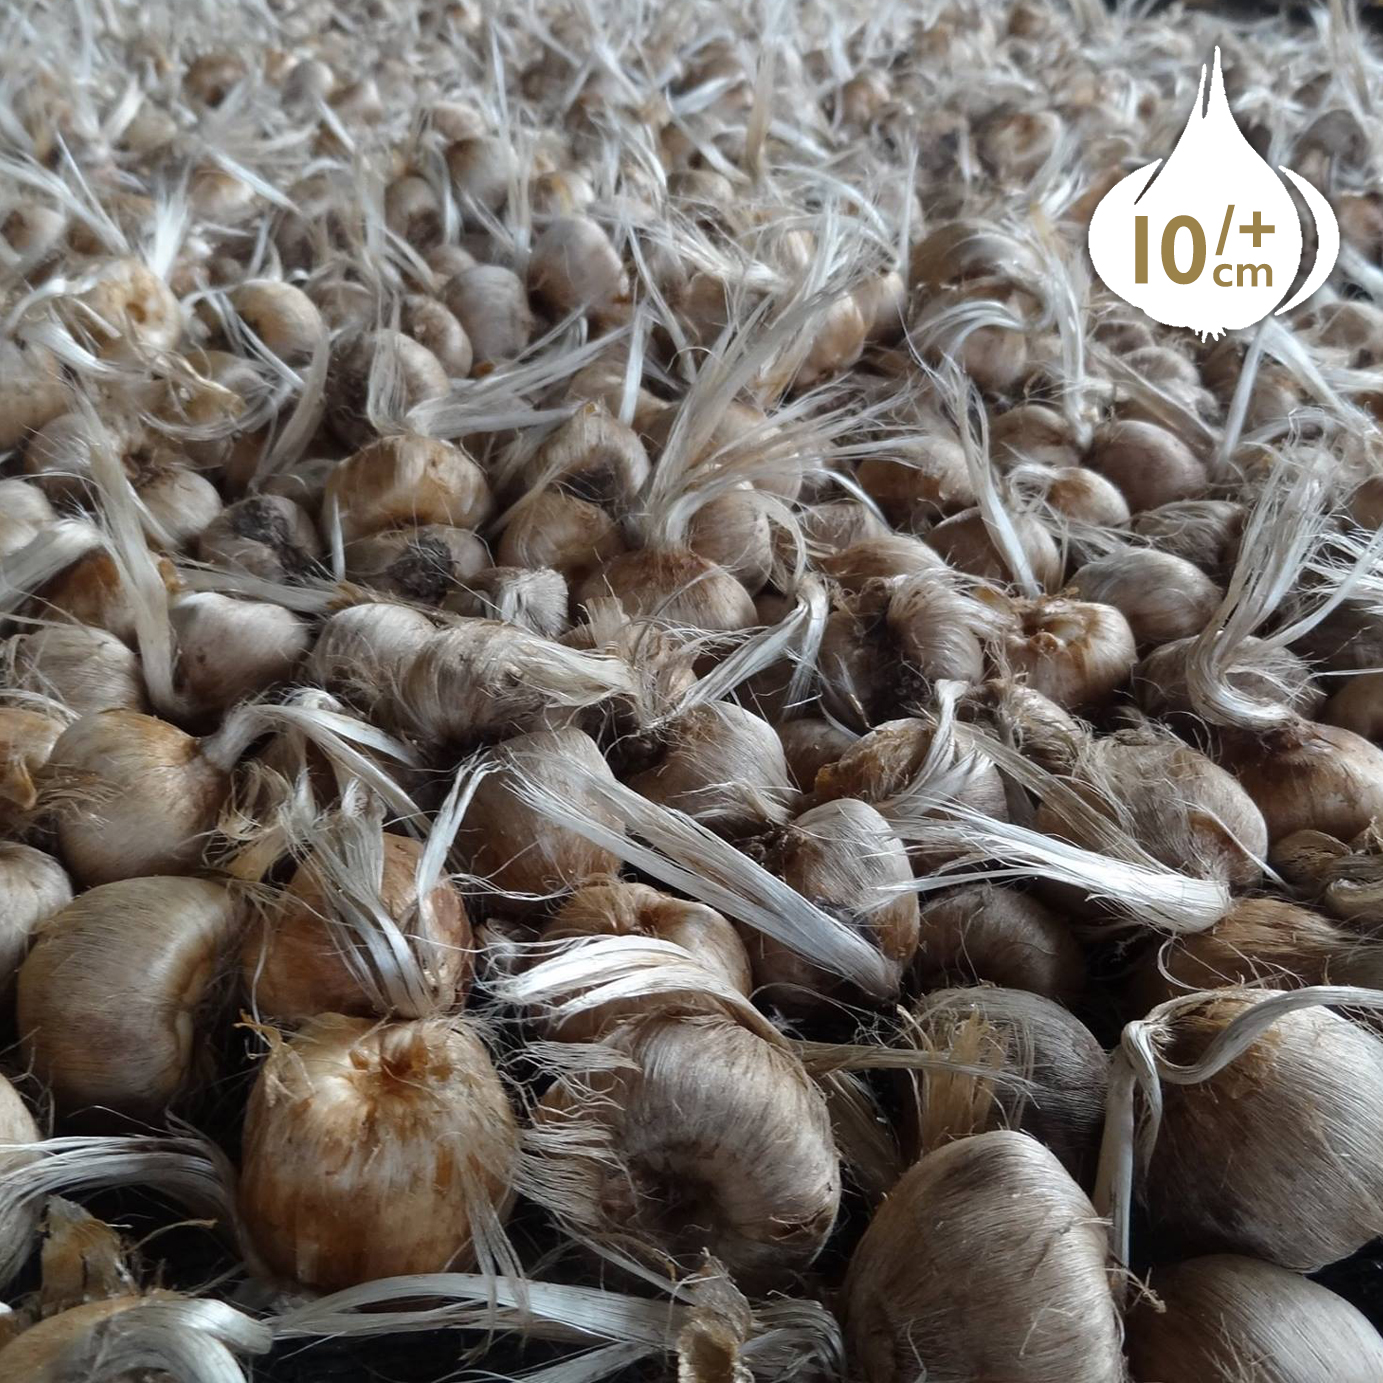 Wholesale Saffron Bulbs (Crocus Sativus) - Buy Saffron Crocus Bulbs